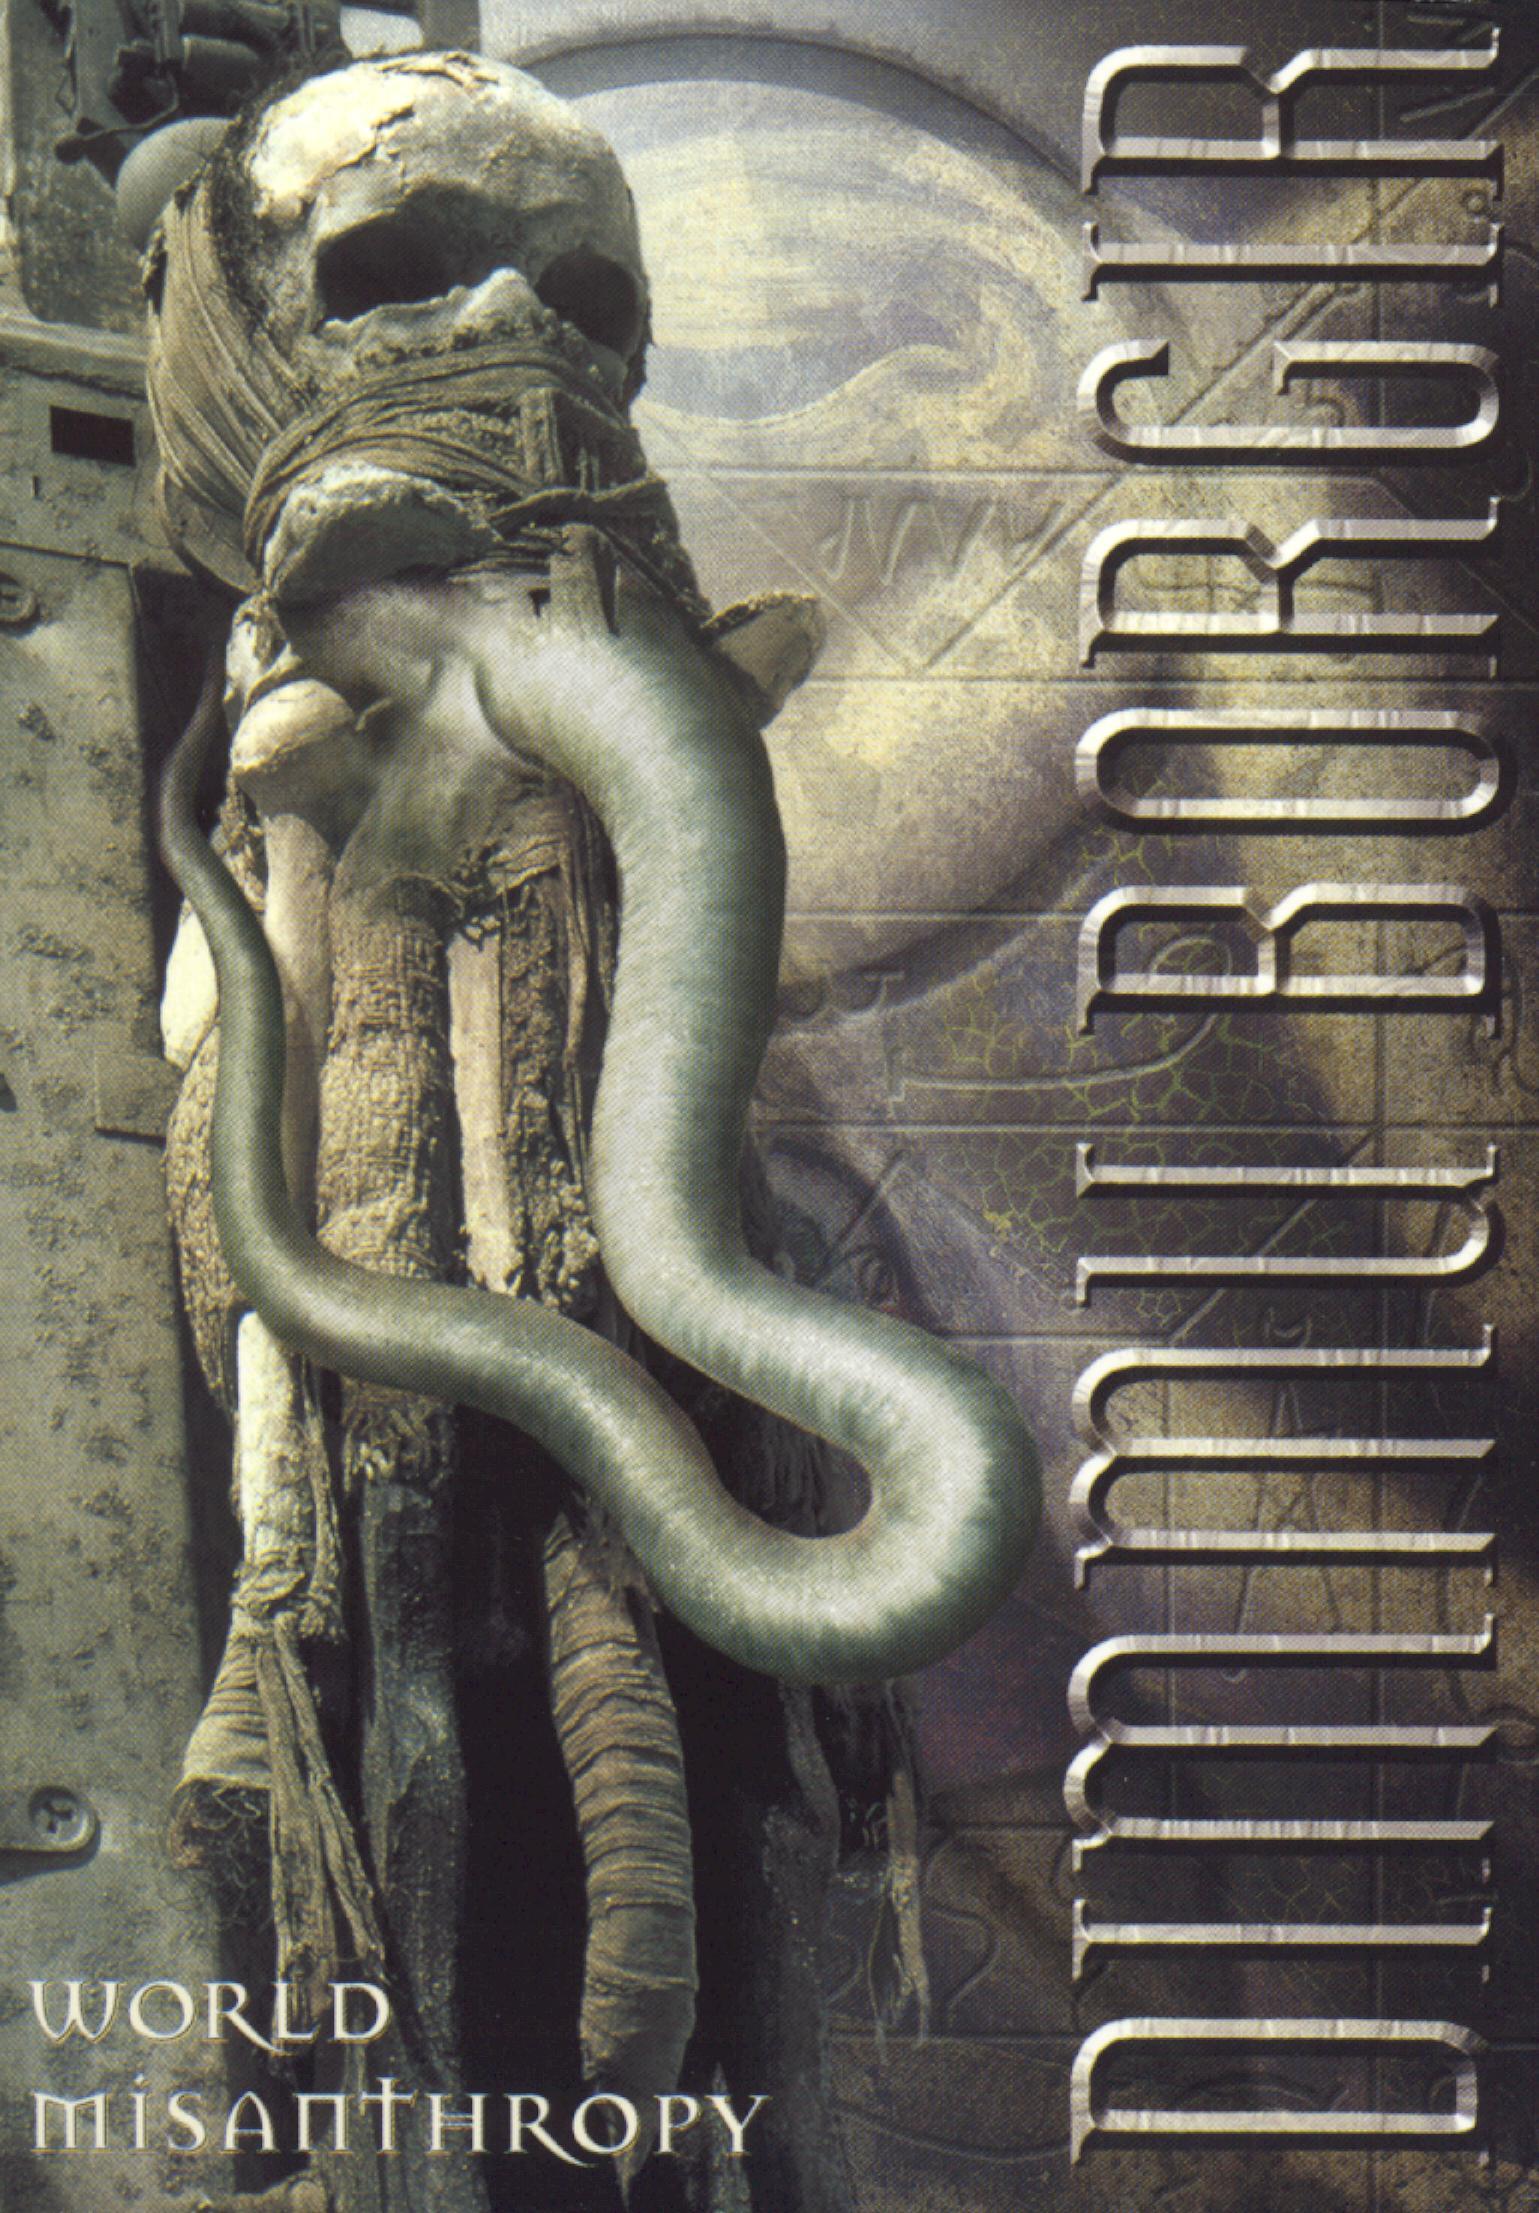 Dimmu Borgir: World Misanthropy (2002)